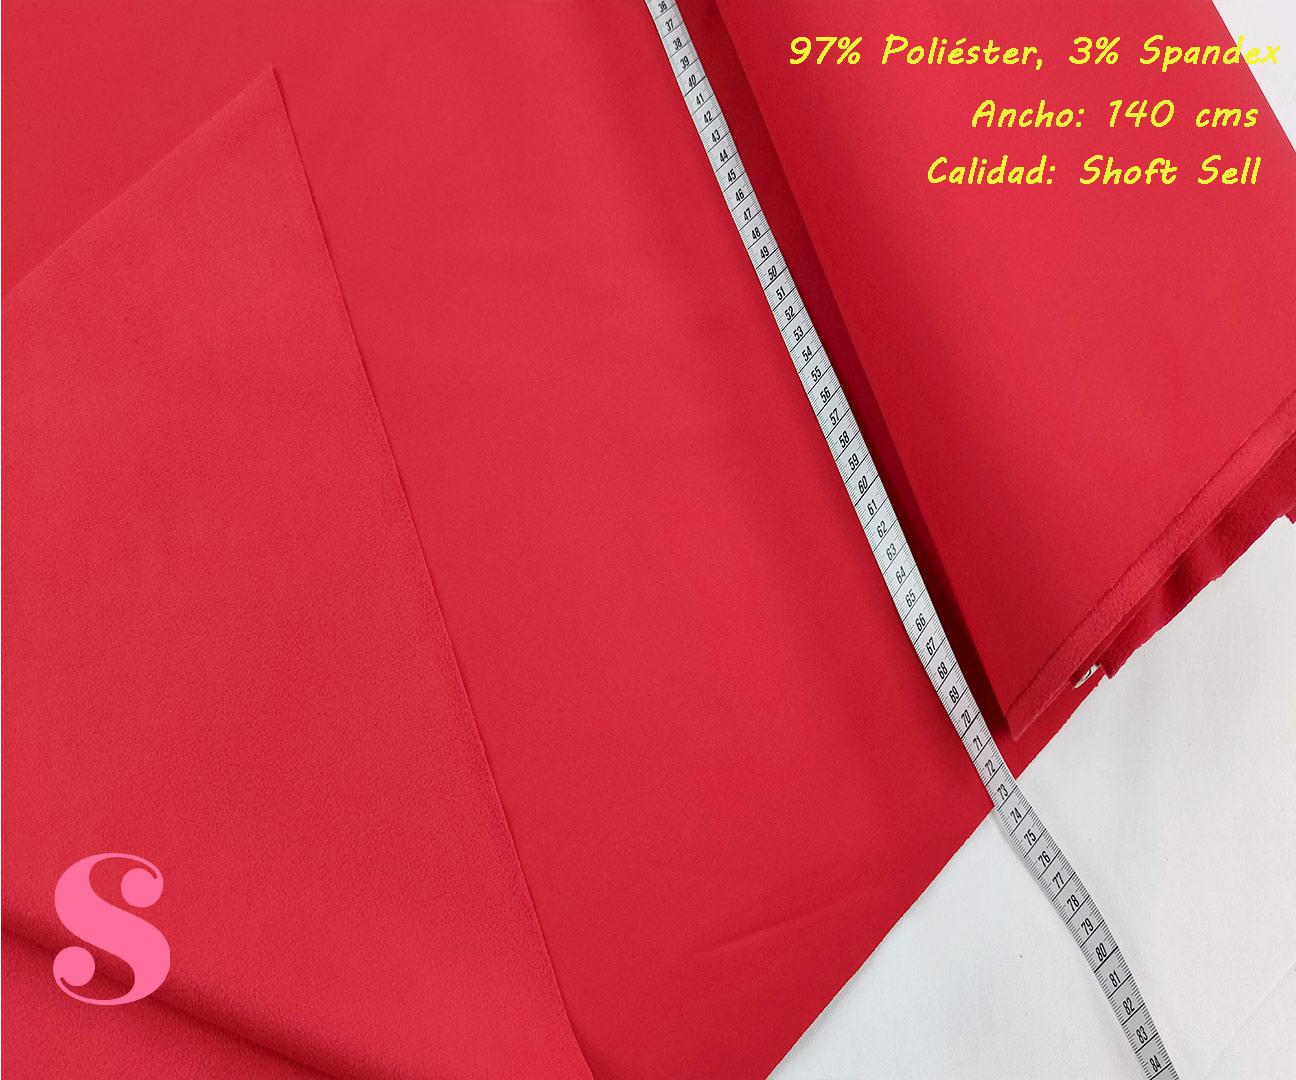 rojo-soft-shell-estrellas-rayas-poliester-Sudaderas-prenda-de-vestir-en-casa-mantas-y-antipilling,Soft Shell Rojo